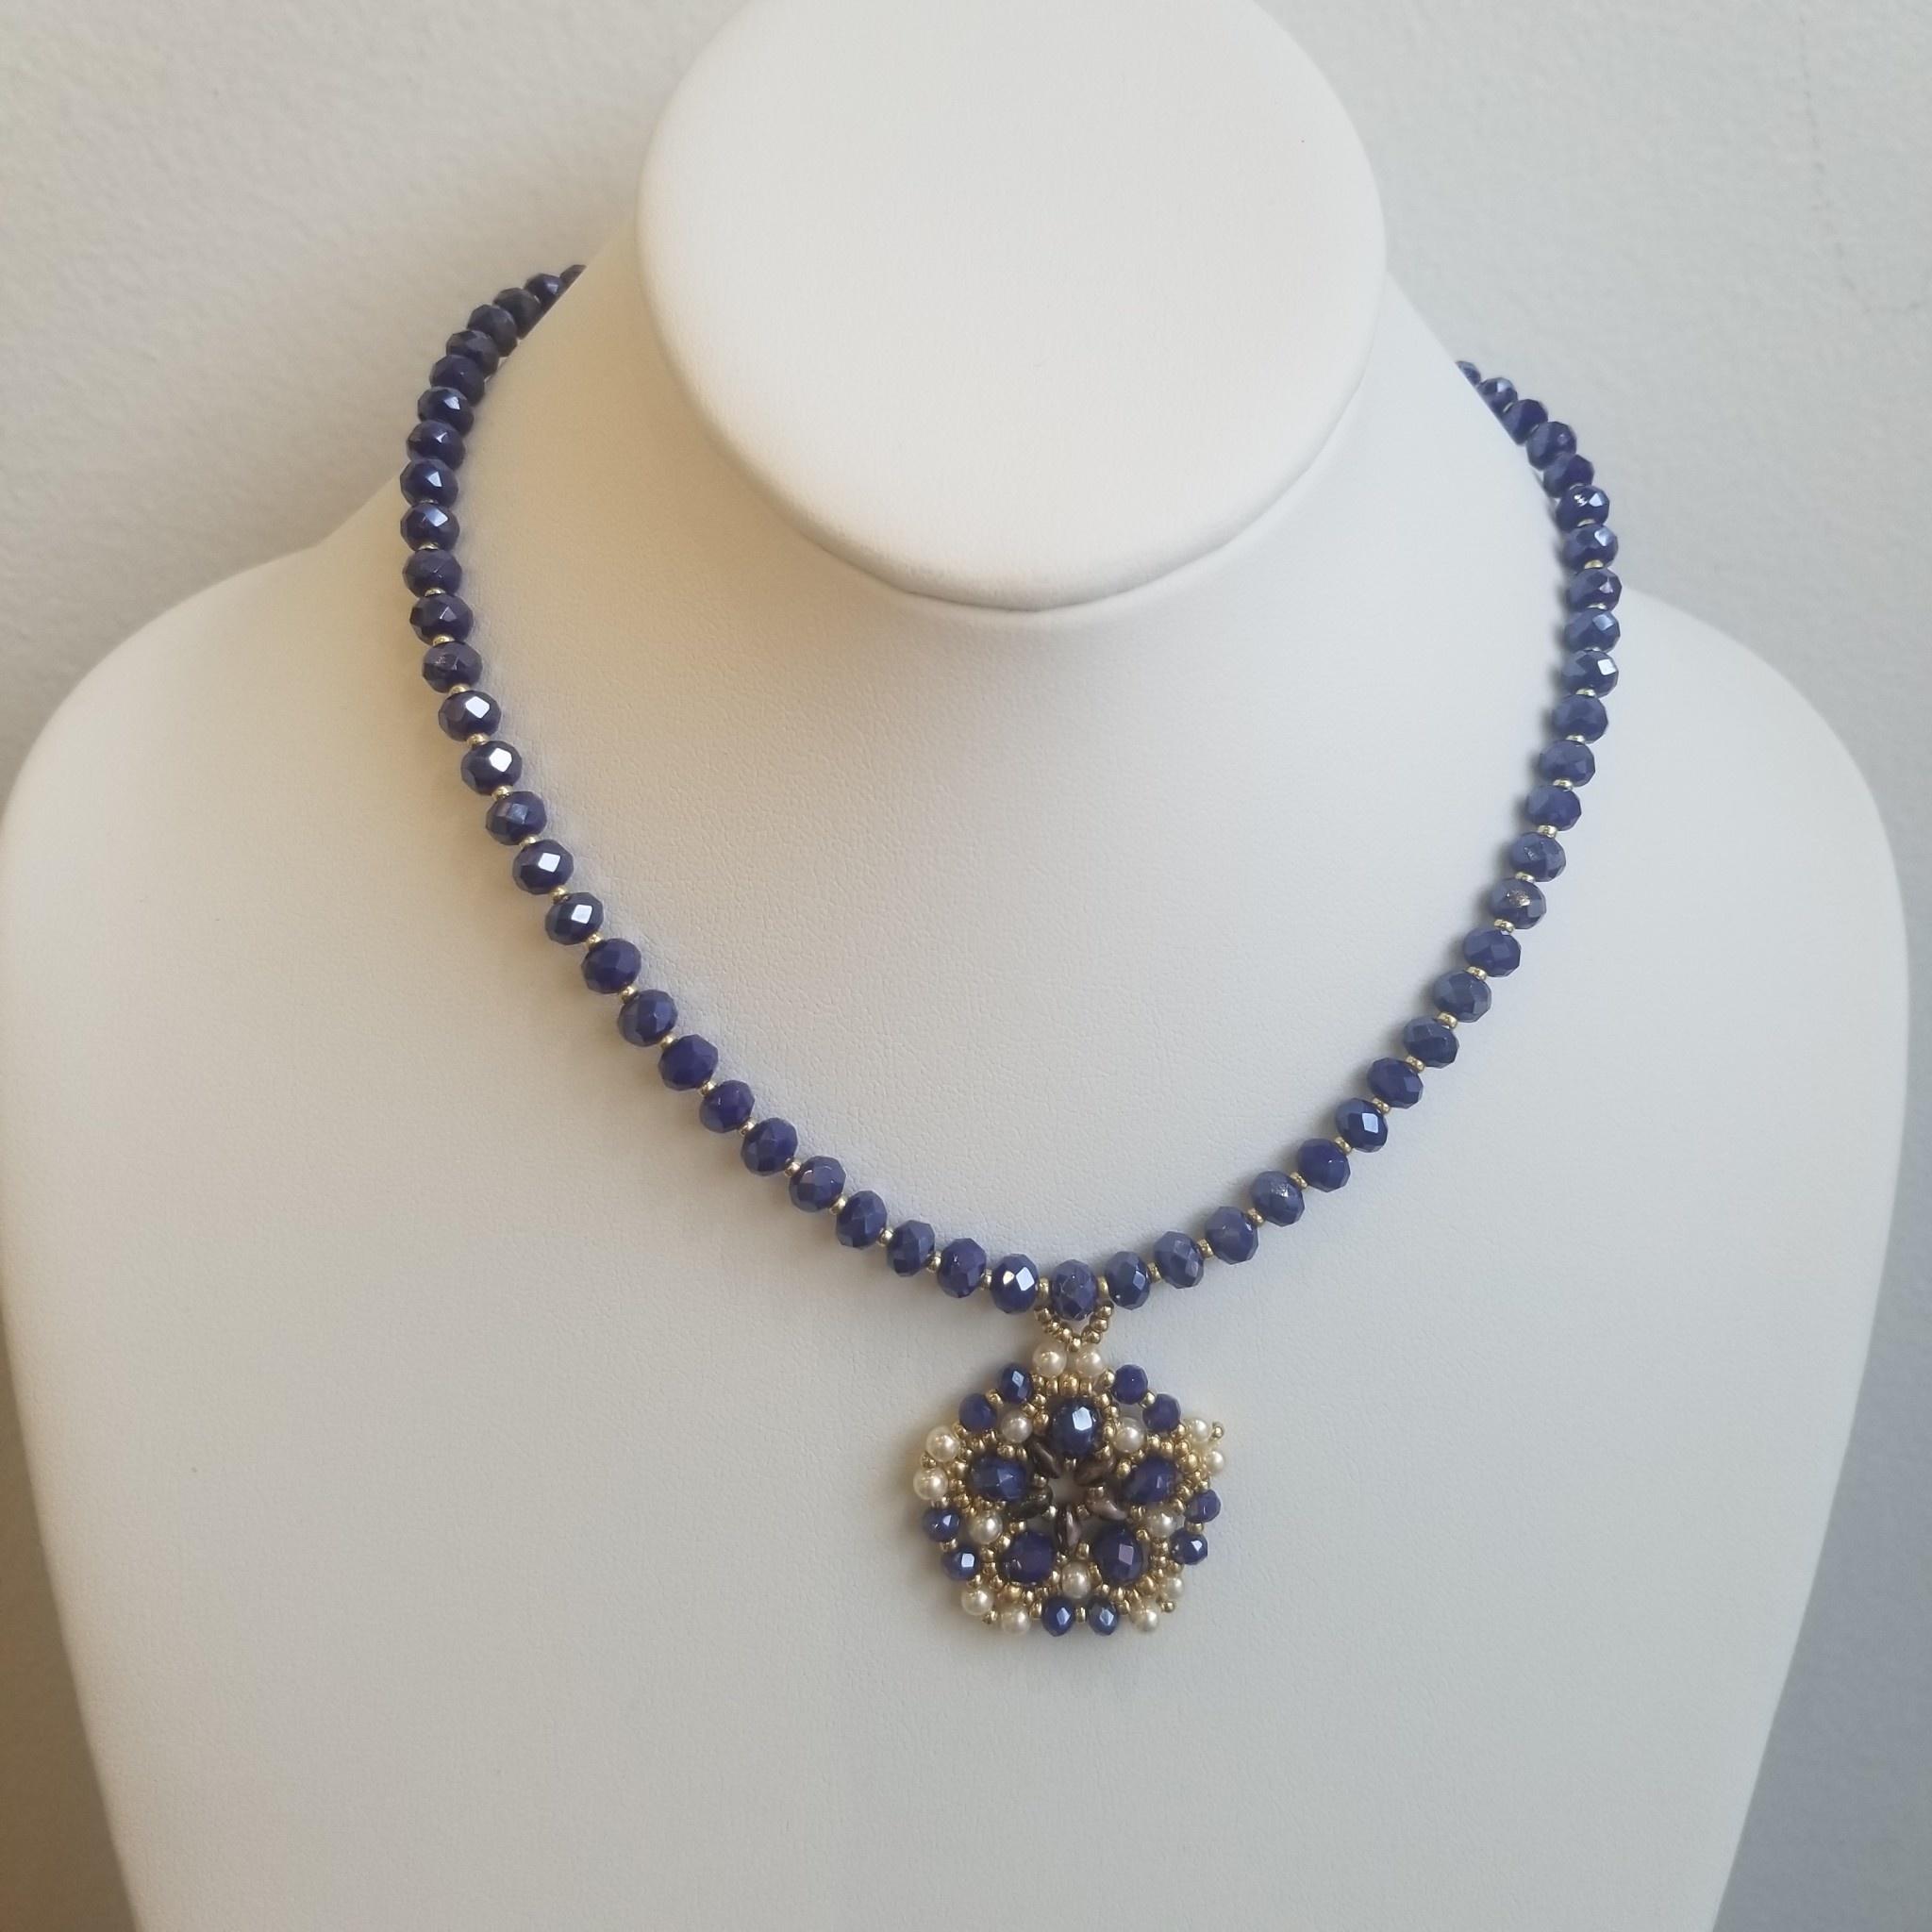 Esmeralda Lambert Royal Blue Pearl Gold Filled Handwoven Pendant Statement Necklace